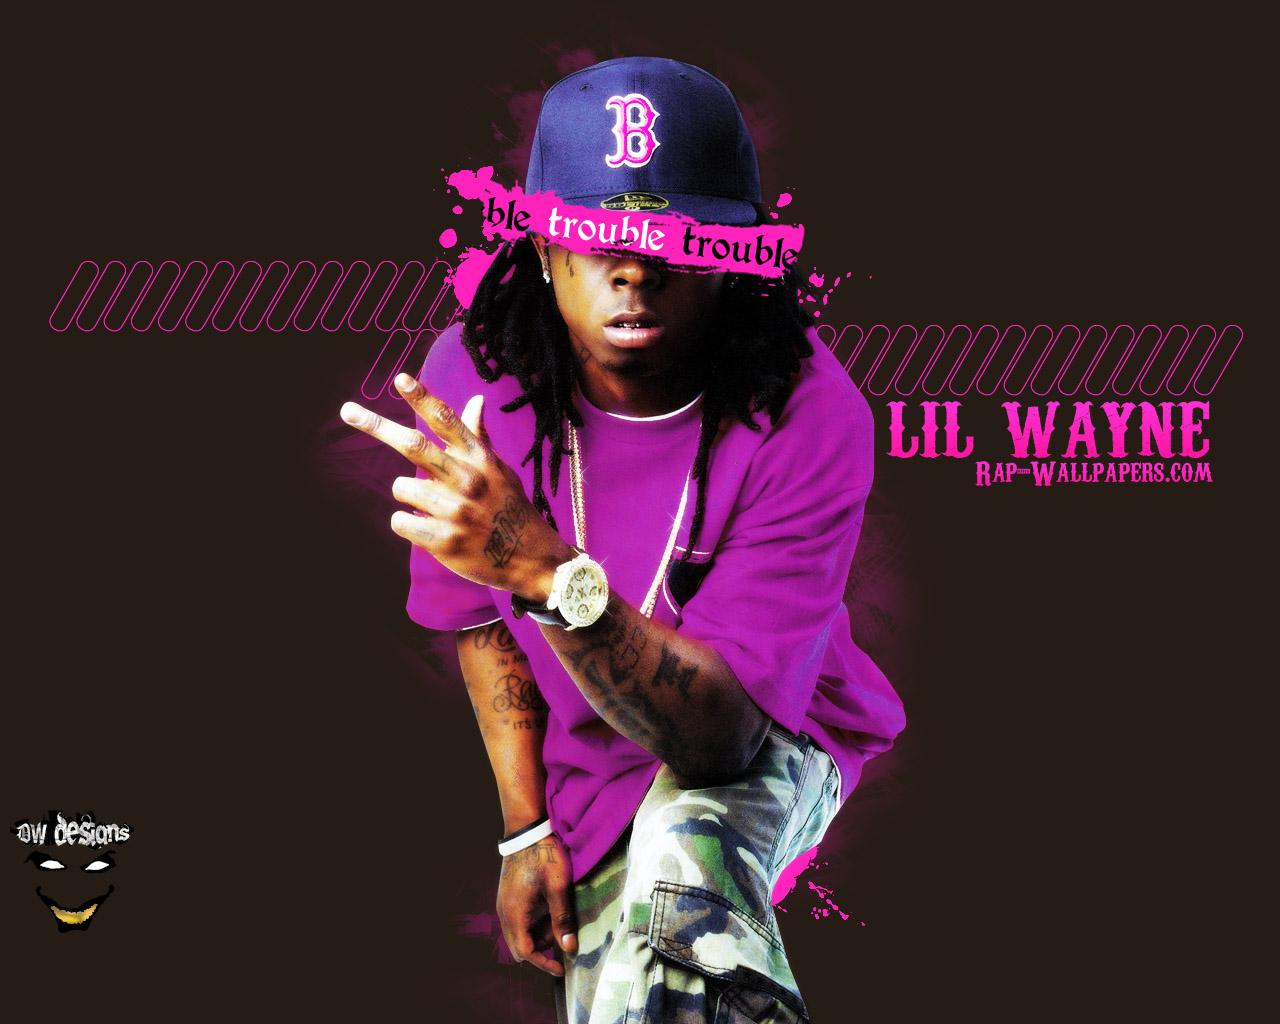 Lil Wayne Trouble Rap Wallpapers 1280x1024